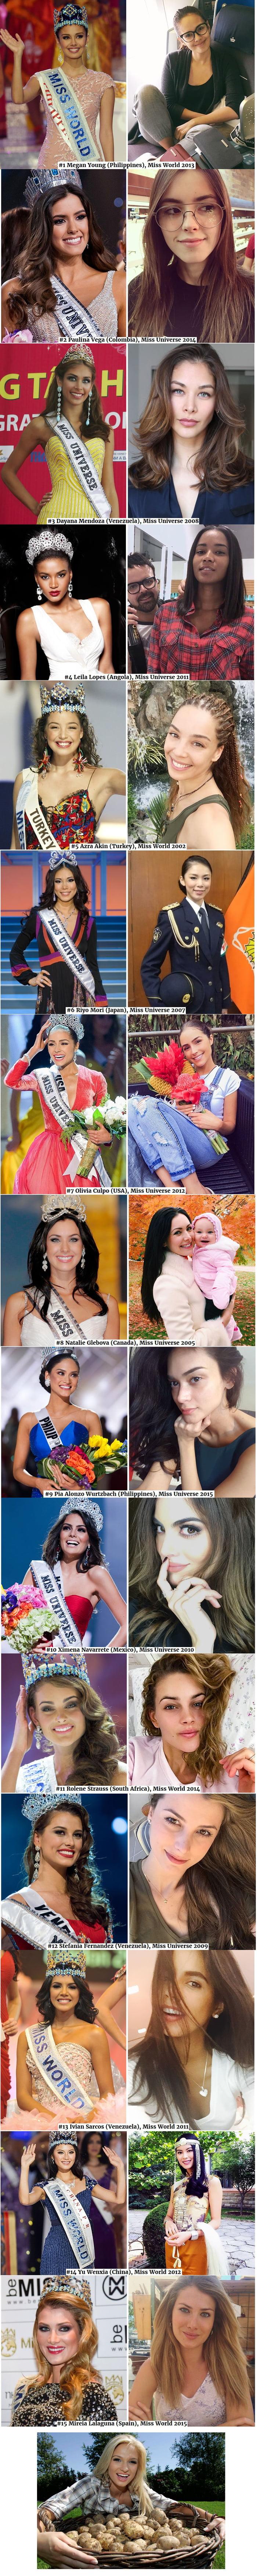 Here's what winning Beauty Queens look like off duty.